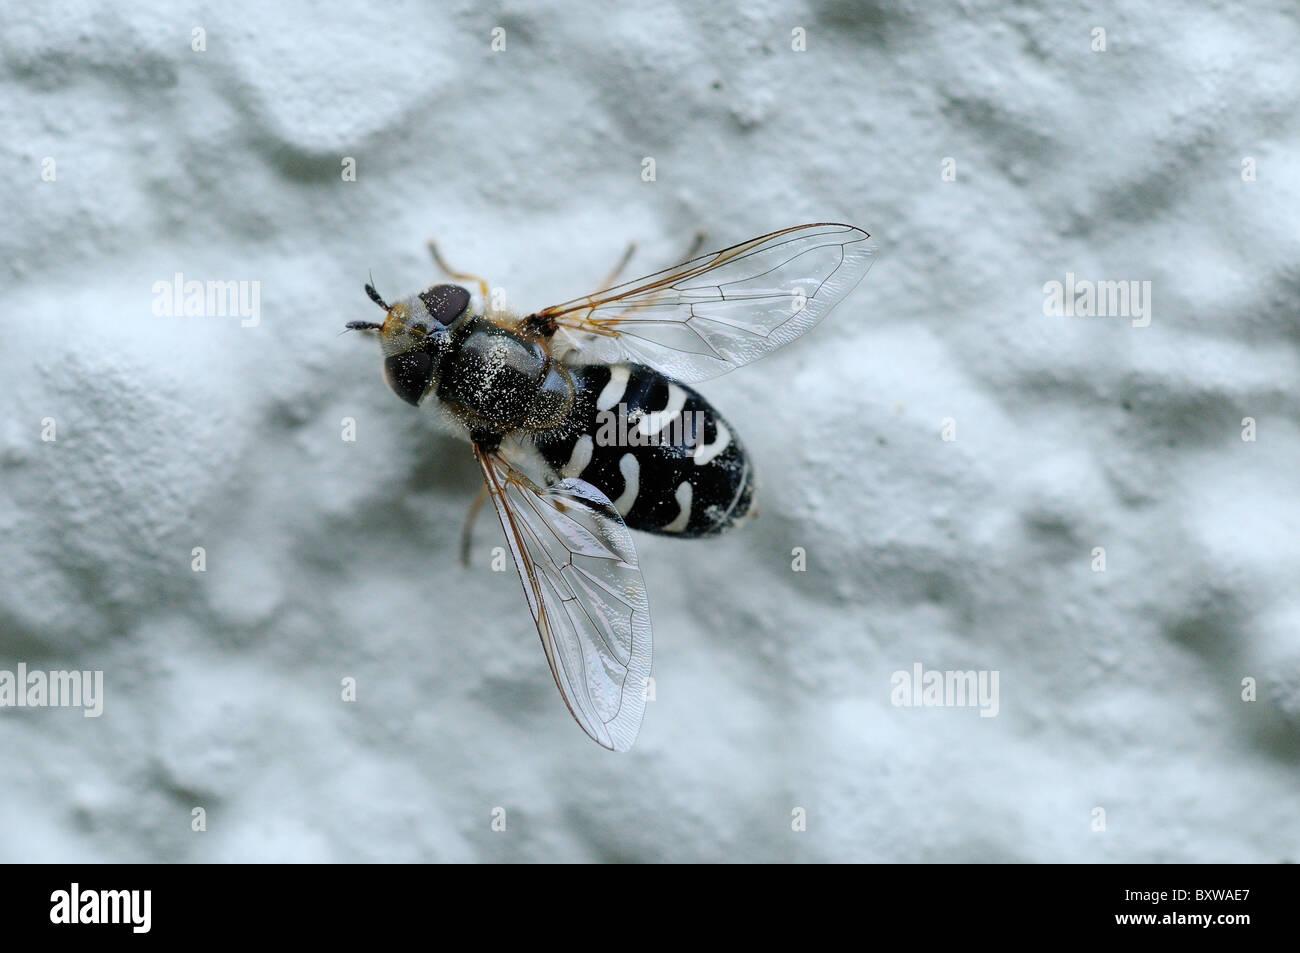 Hover-fly (Scaeva pyrastri) resting on wall, Oxfordshire, UK. - Stock Image